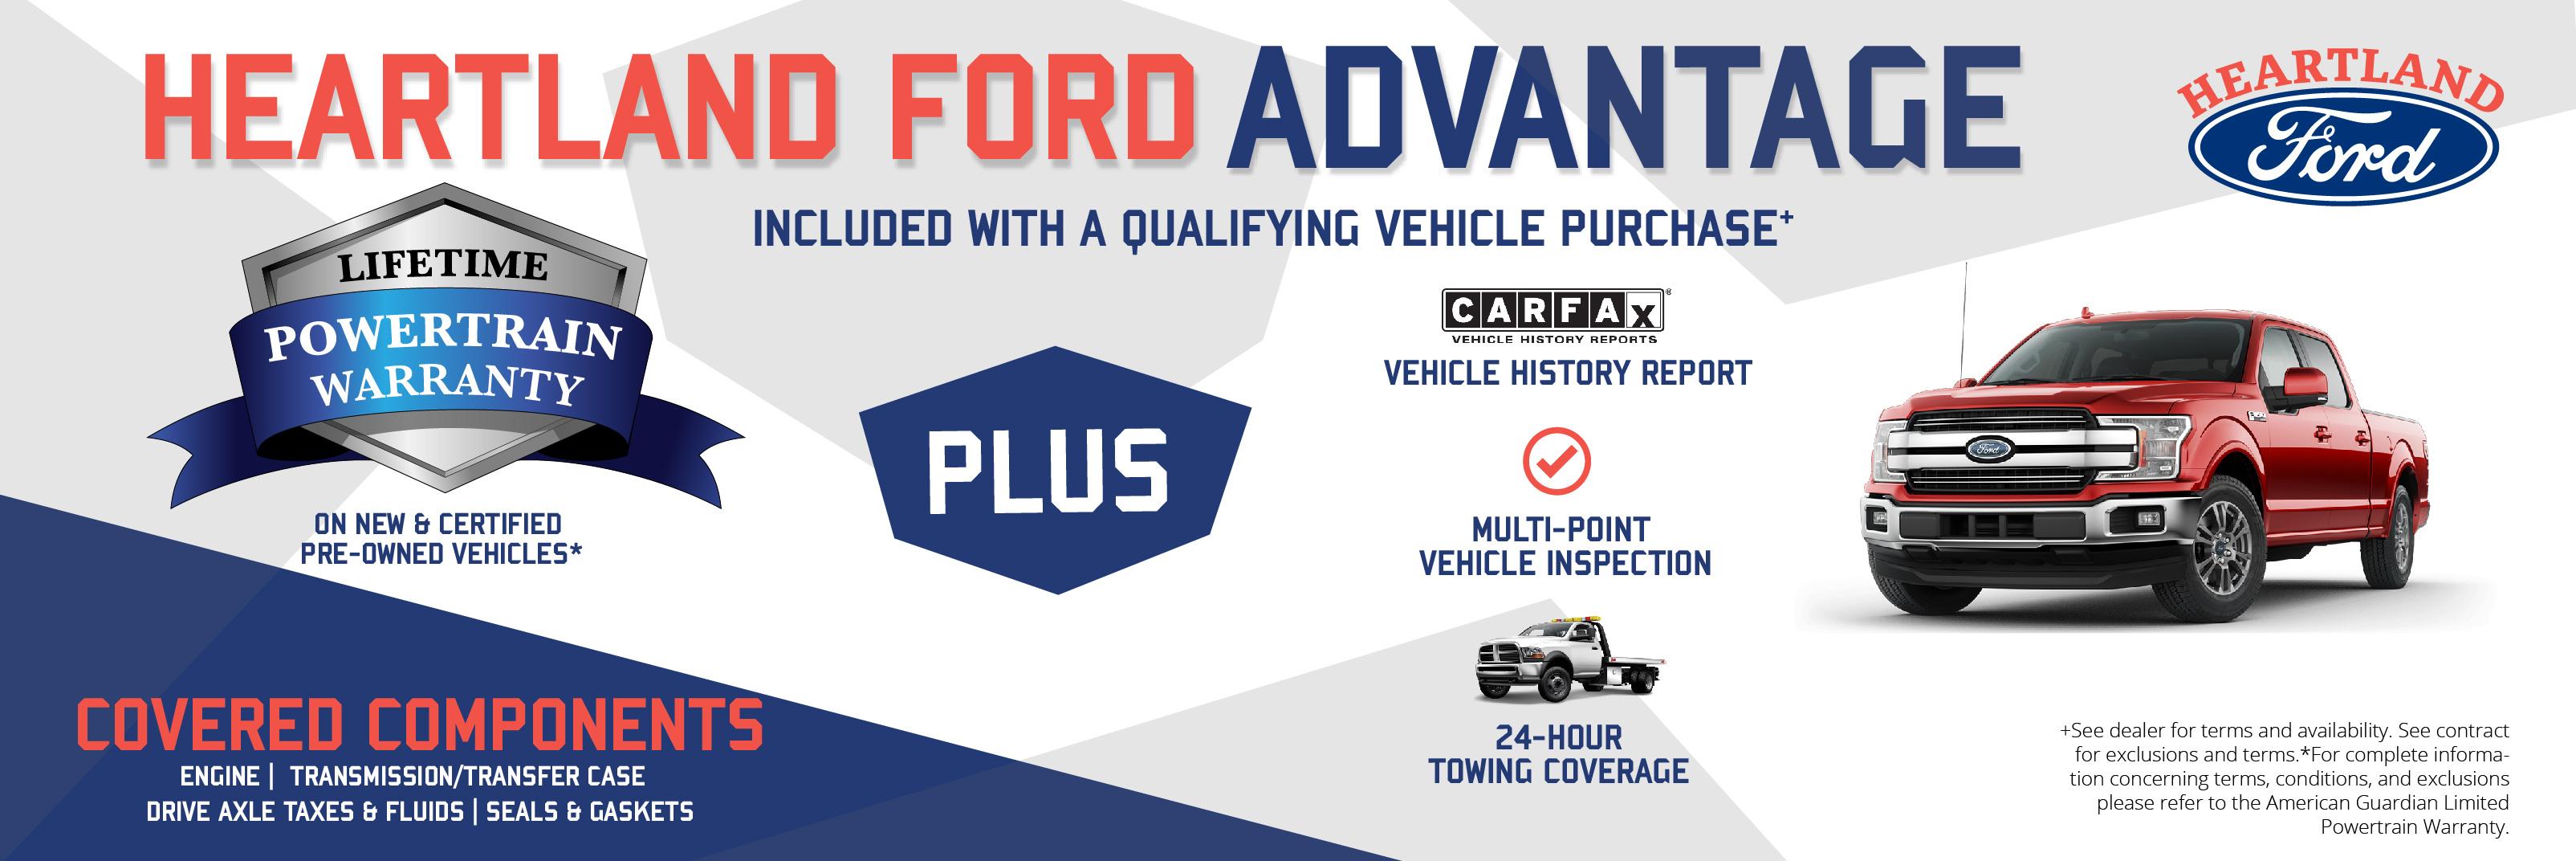 Heartland Ford Advantage